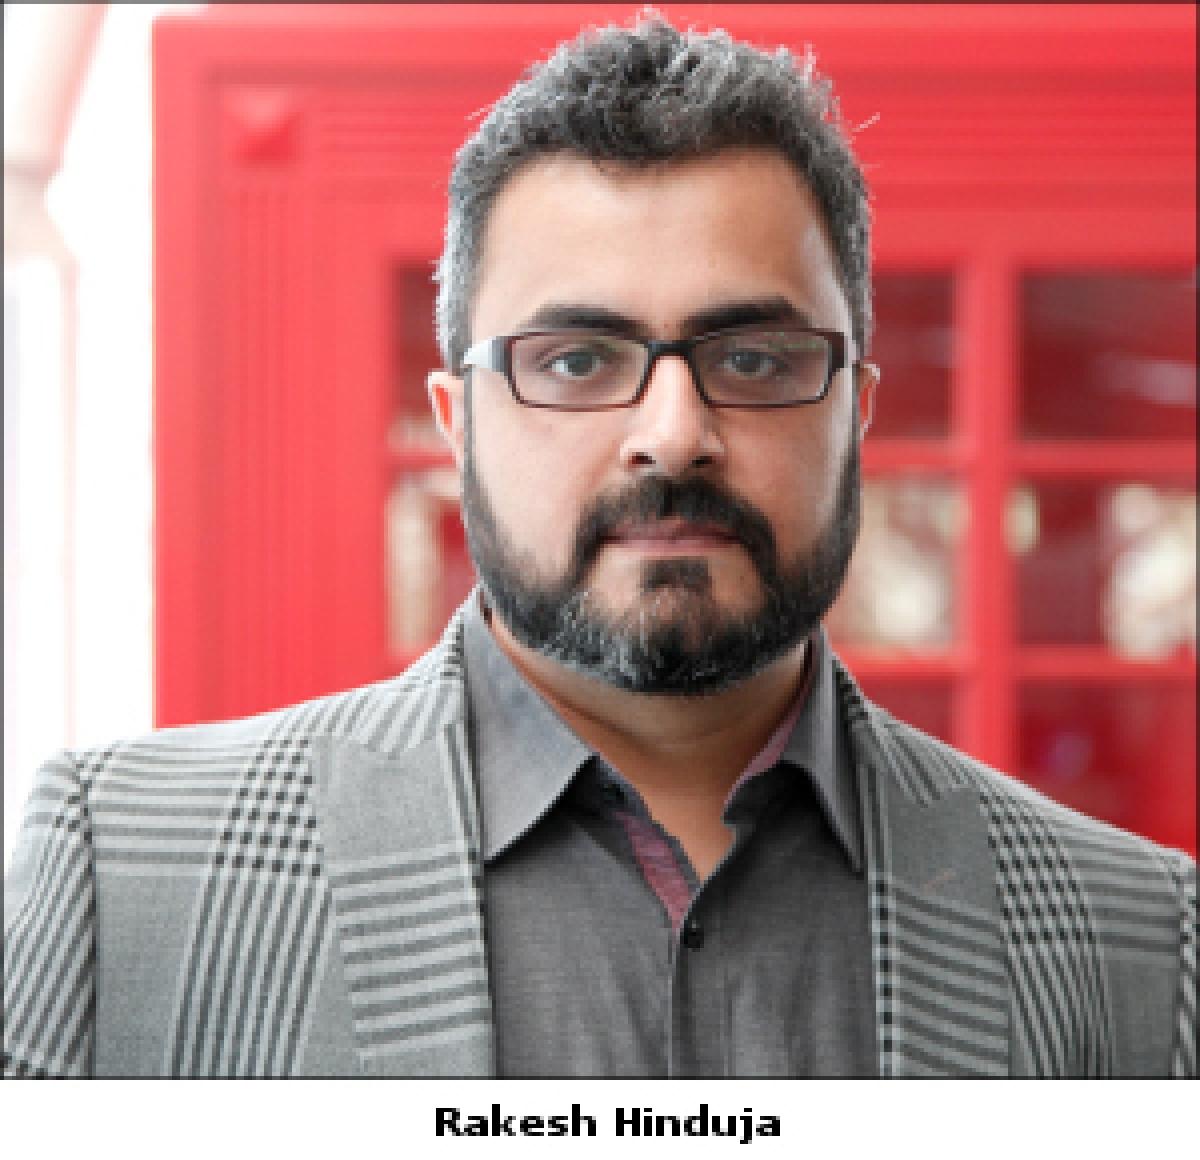 Leo Burnett elevates Rakesh Hinduja to Executive Director and Branch Head, Mumbai